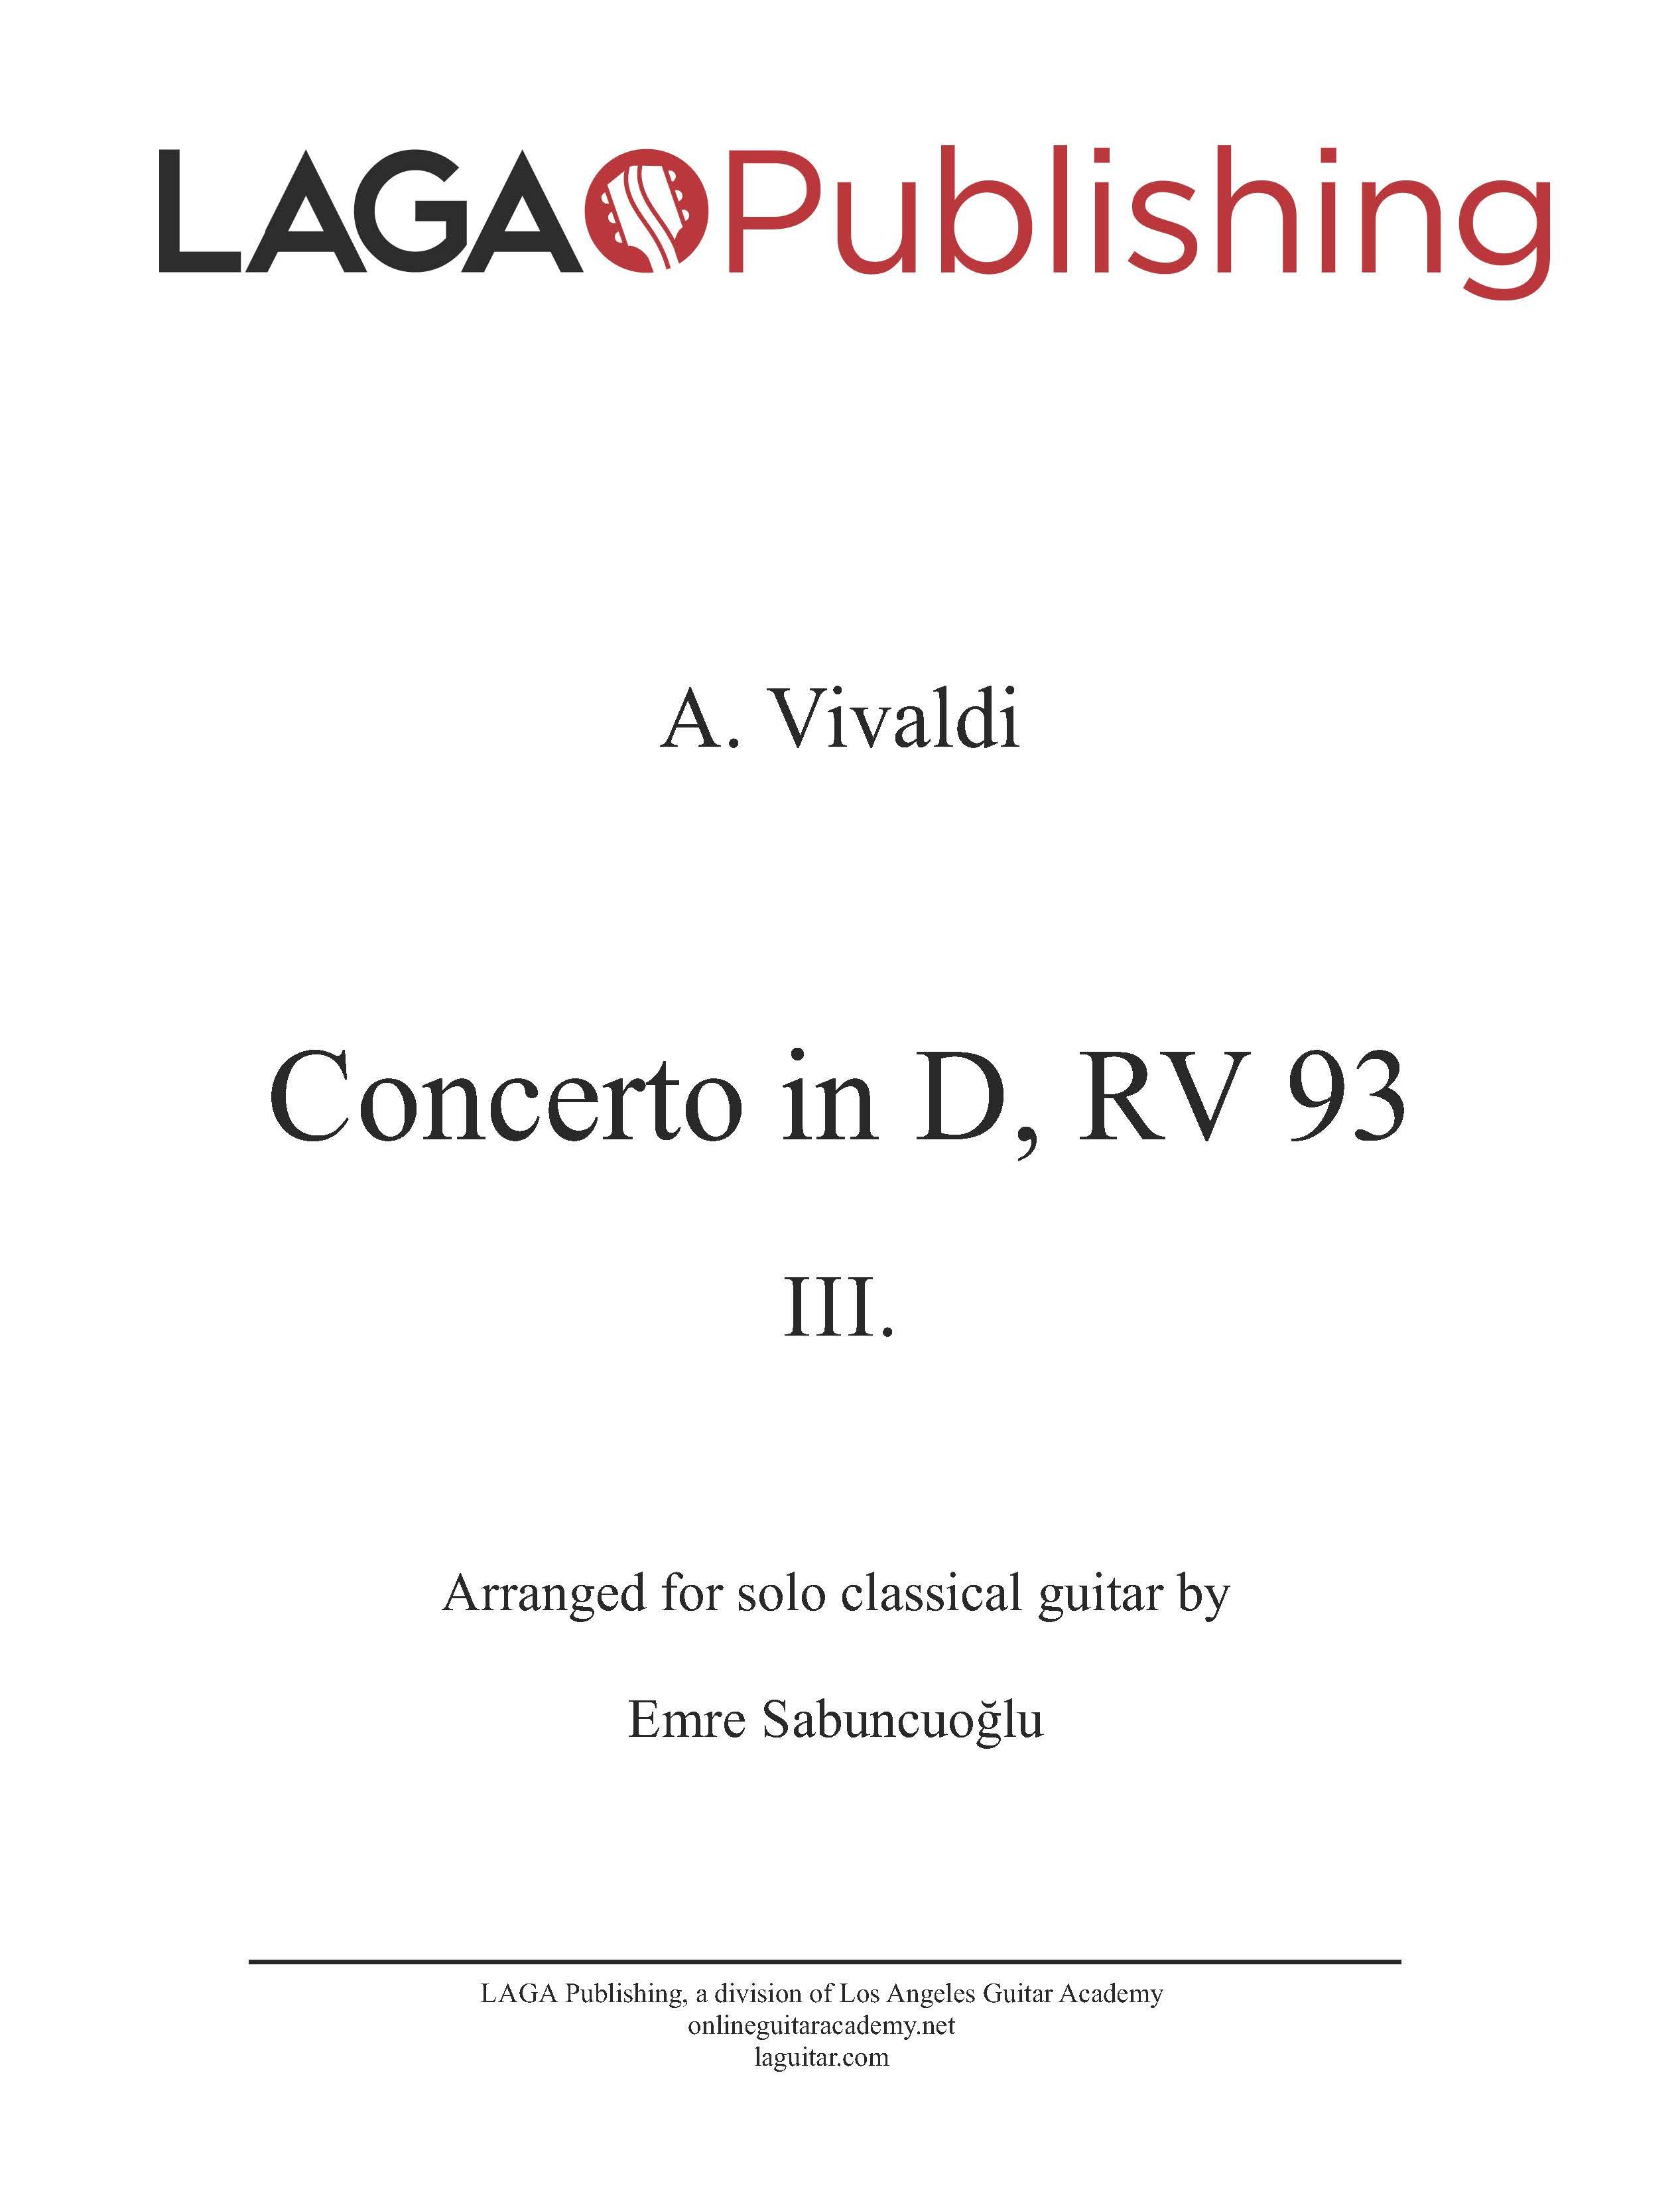 LAGA-Publishing-Vivaldi-Concerto-RV93-III-Score-and-Tab